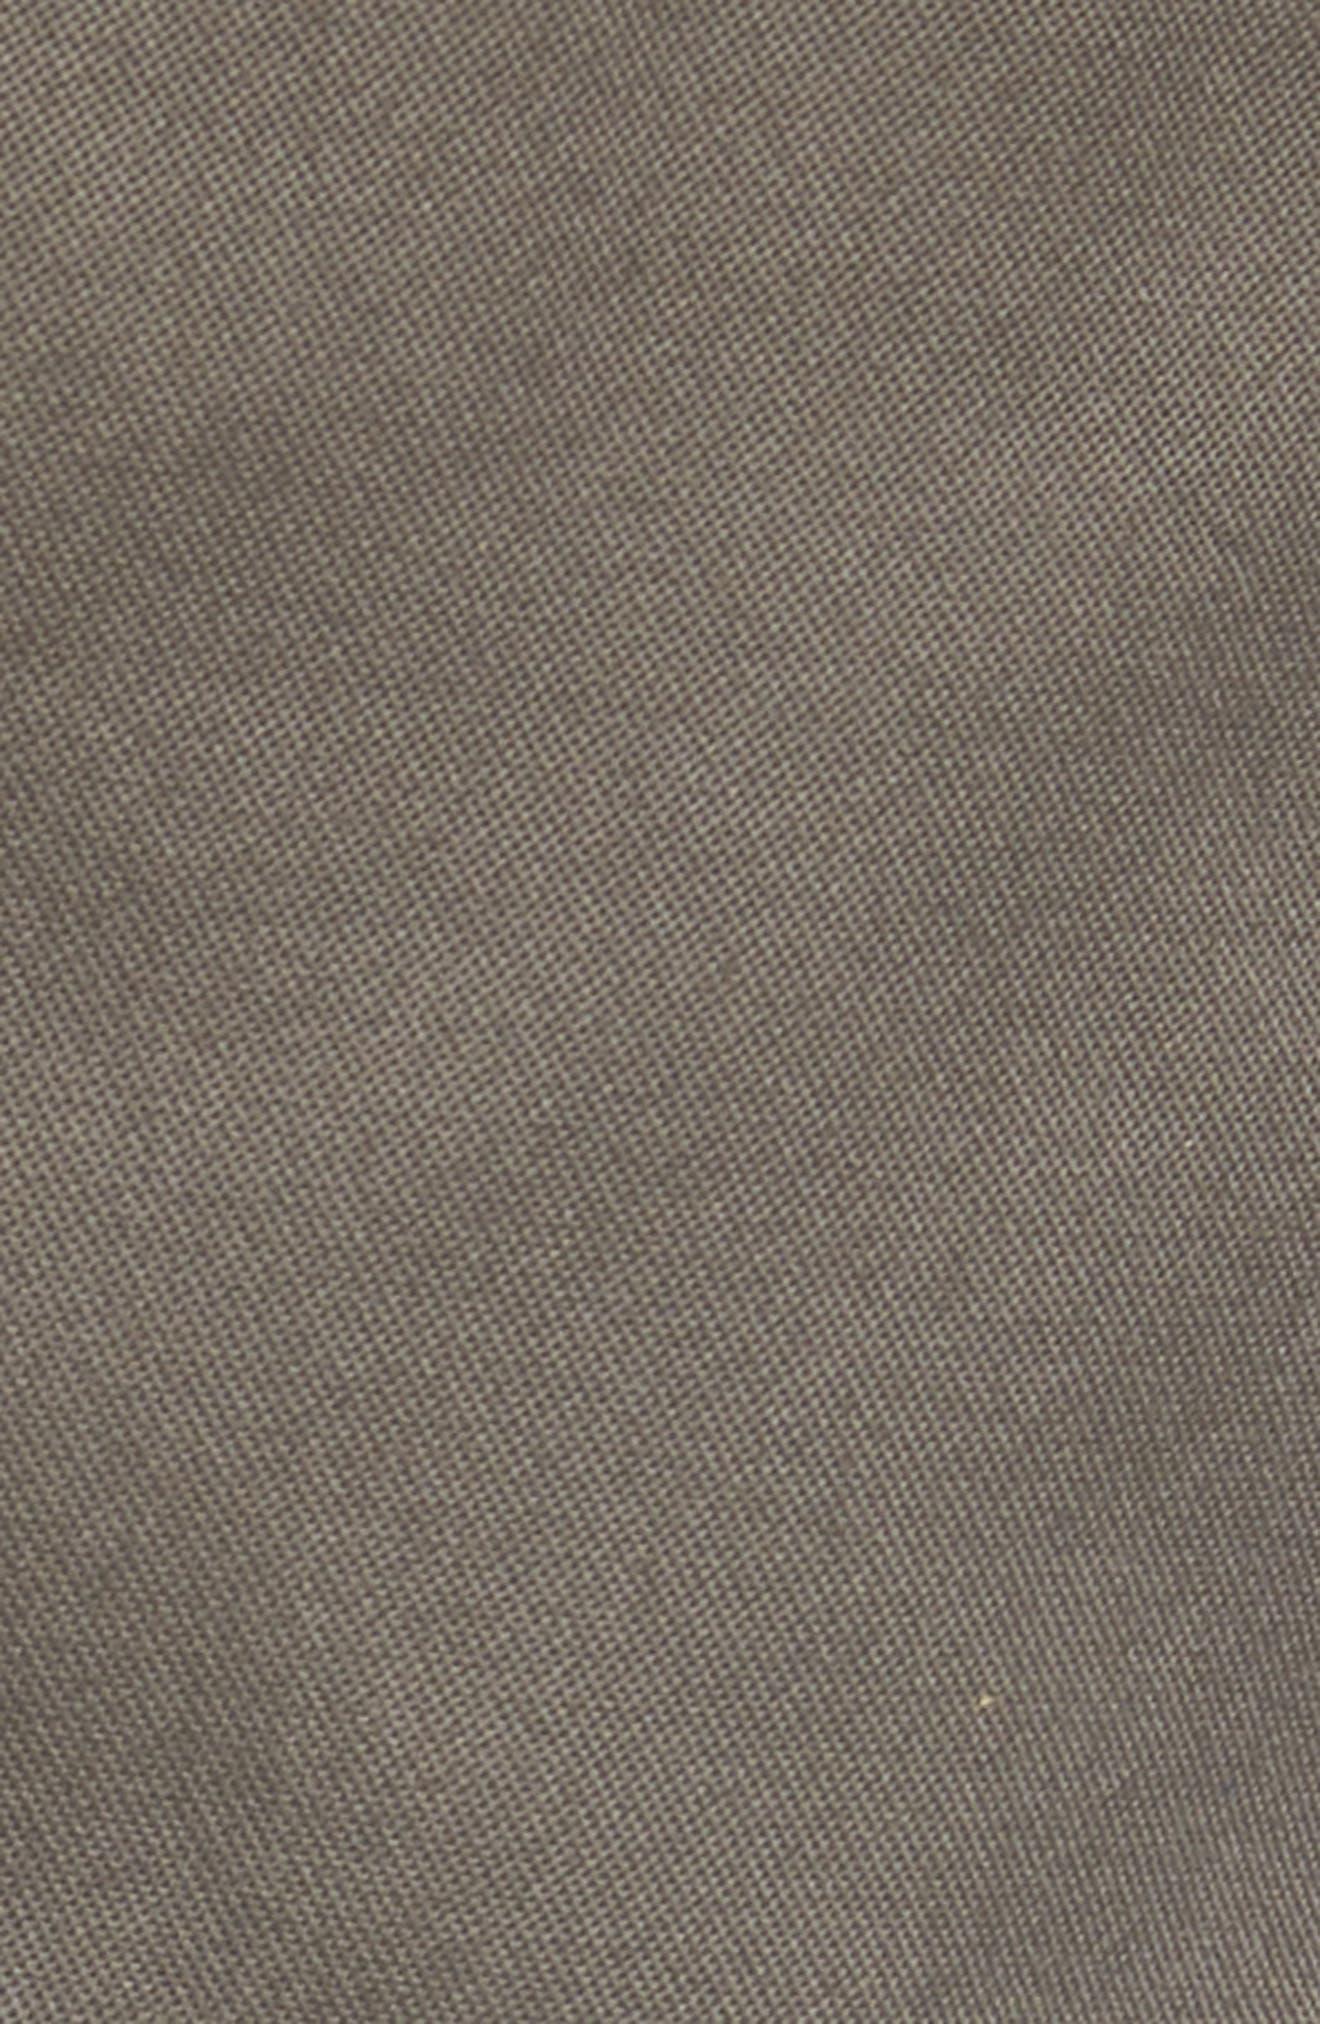 Sureshot Cargo Shorts,                             Alternate thumbnail 5, color,                             Peat